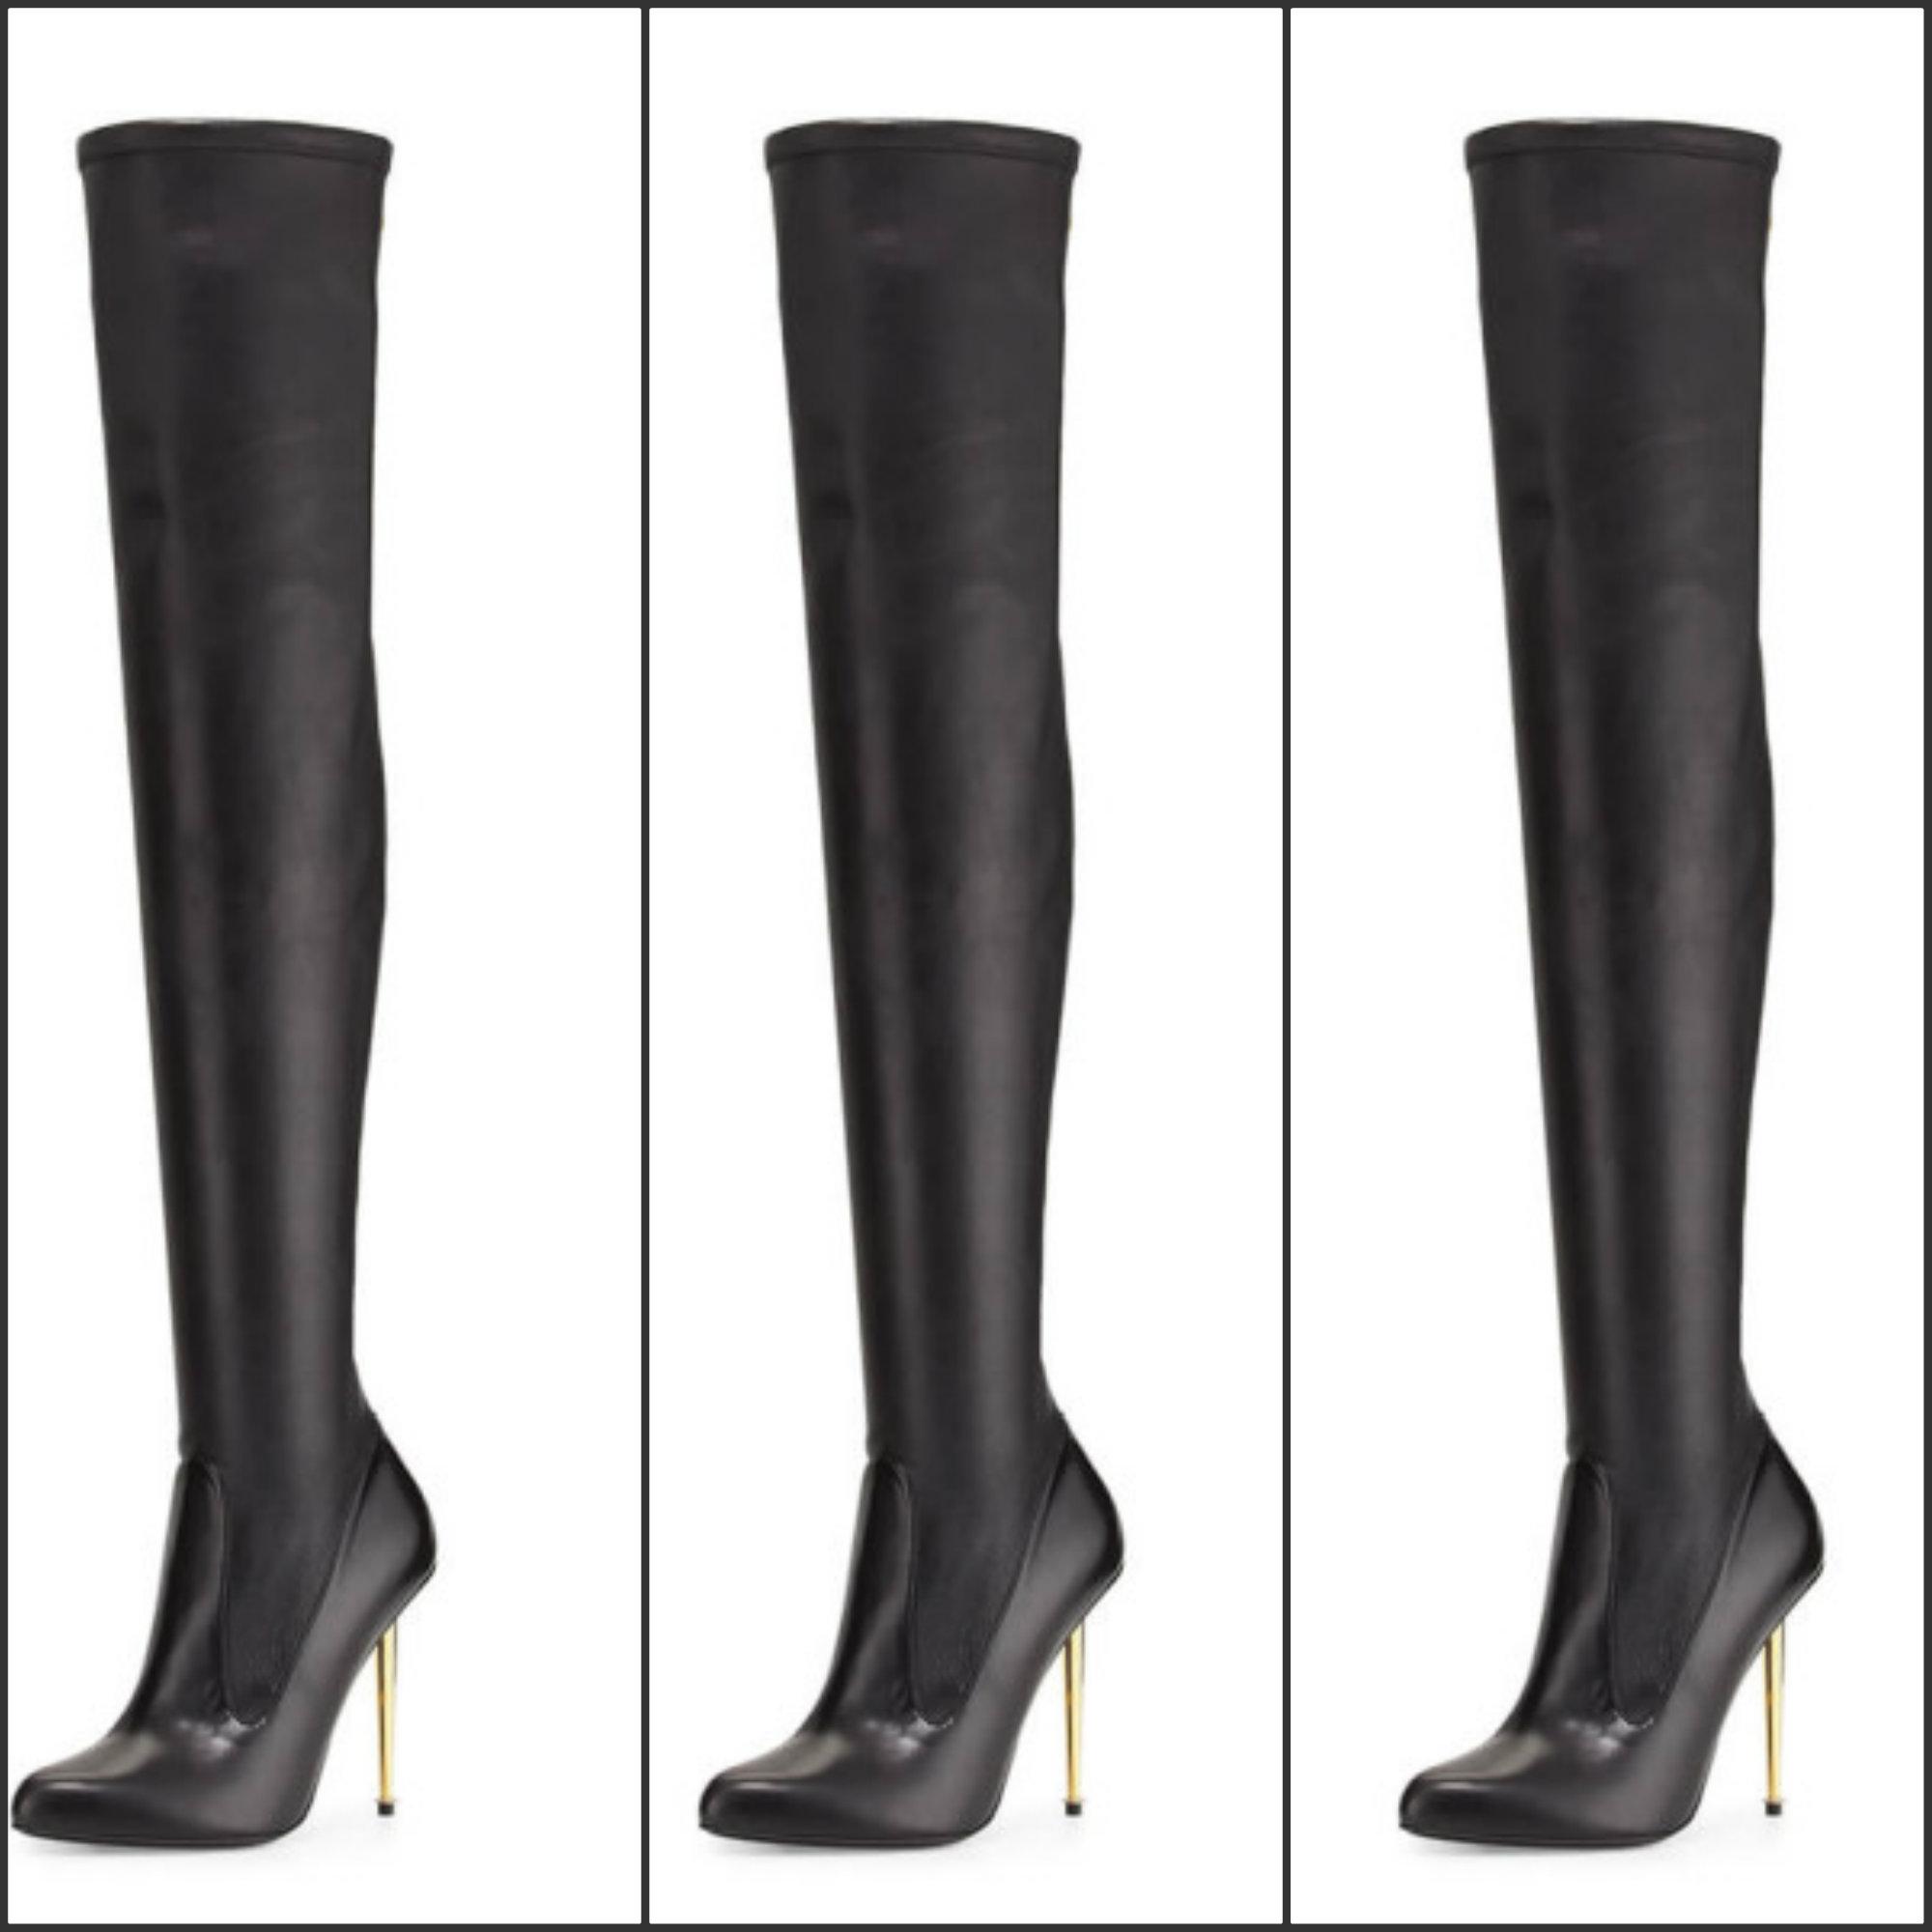 in lyst shoes black heels tom sandals plisse ford pliss satin